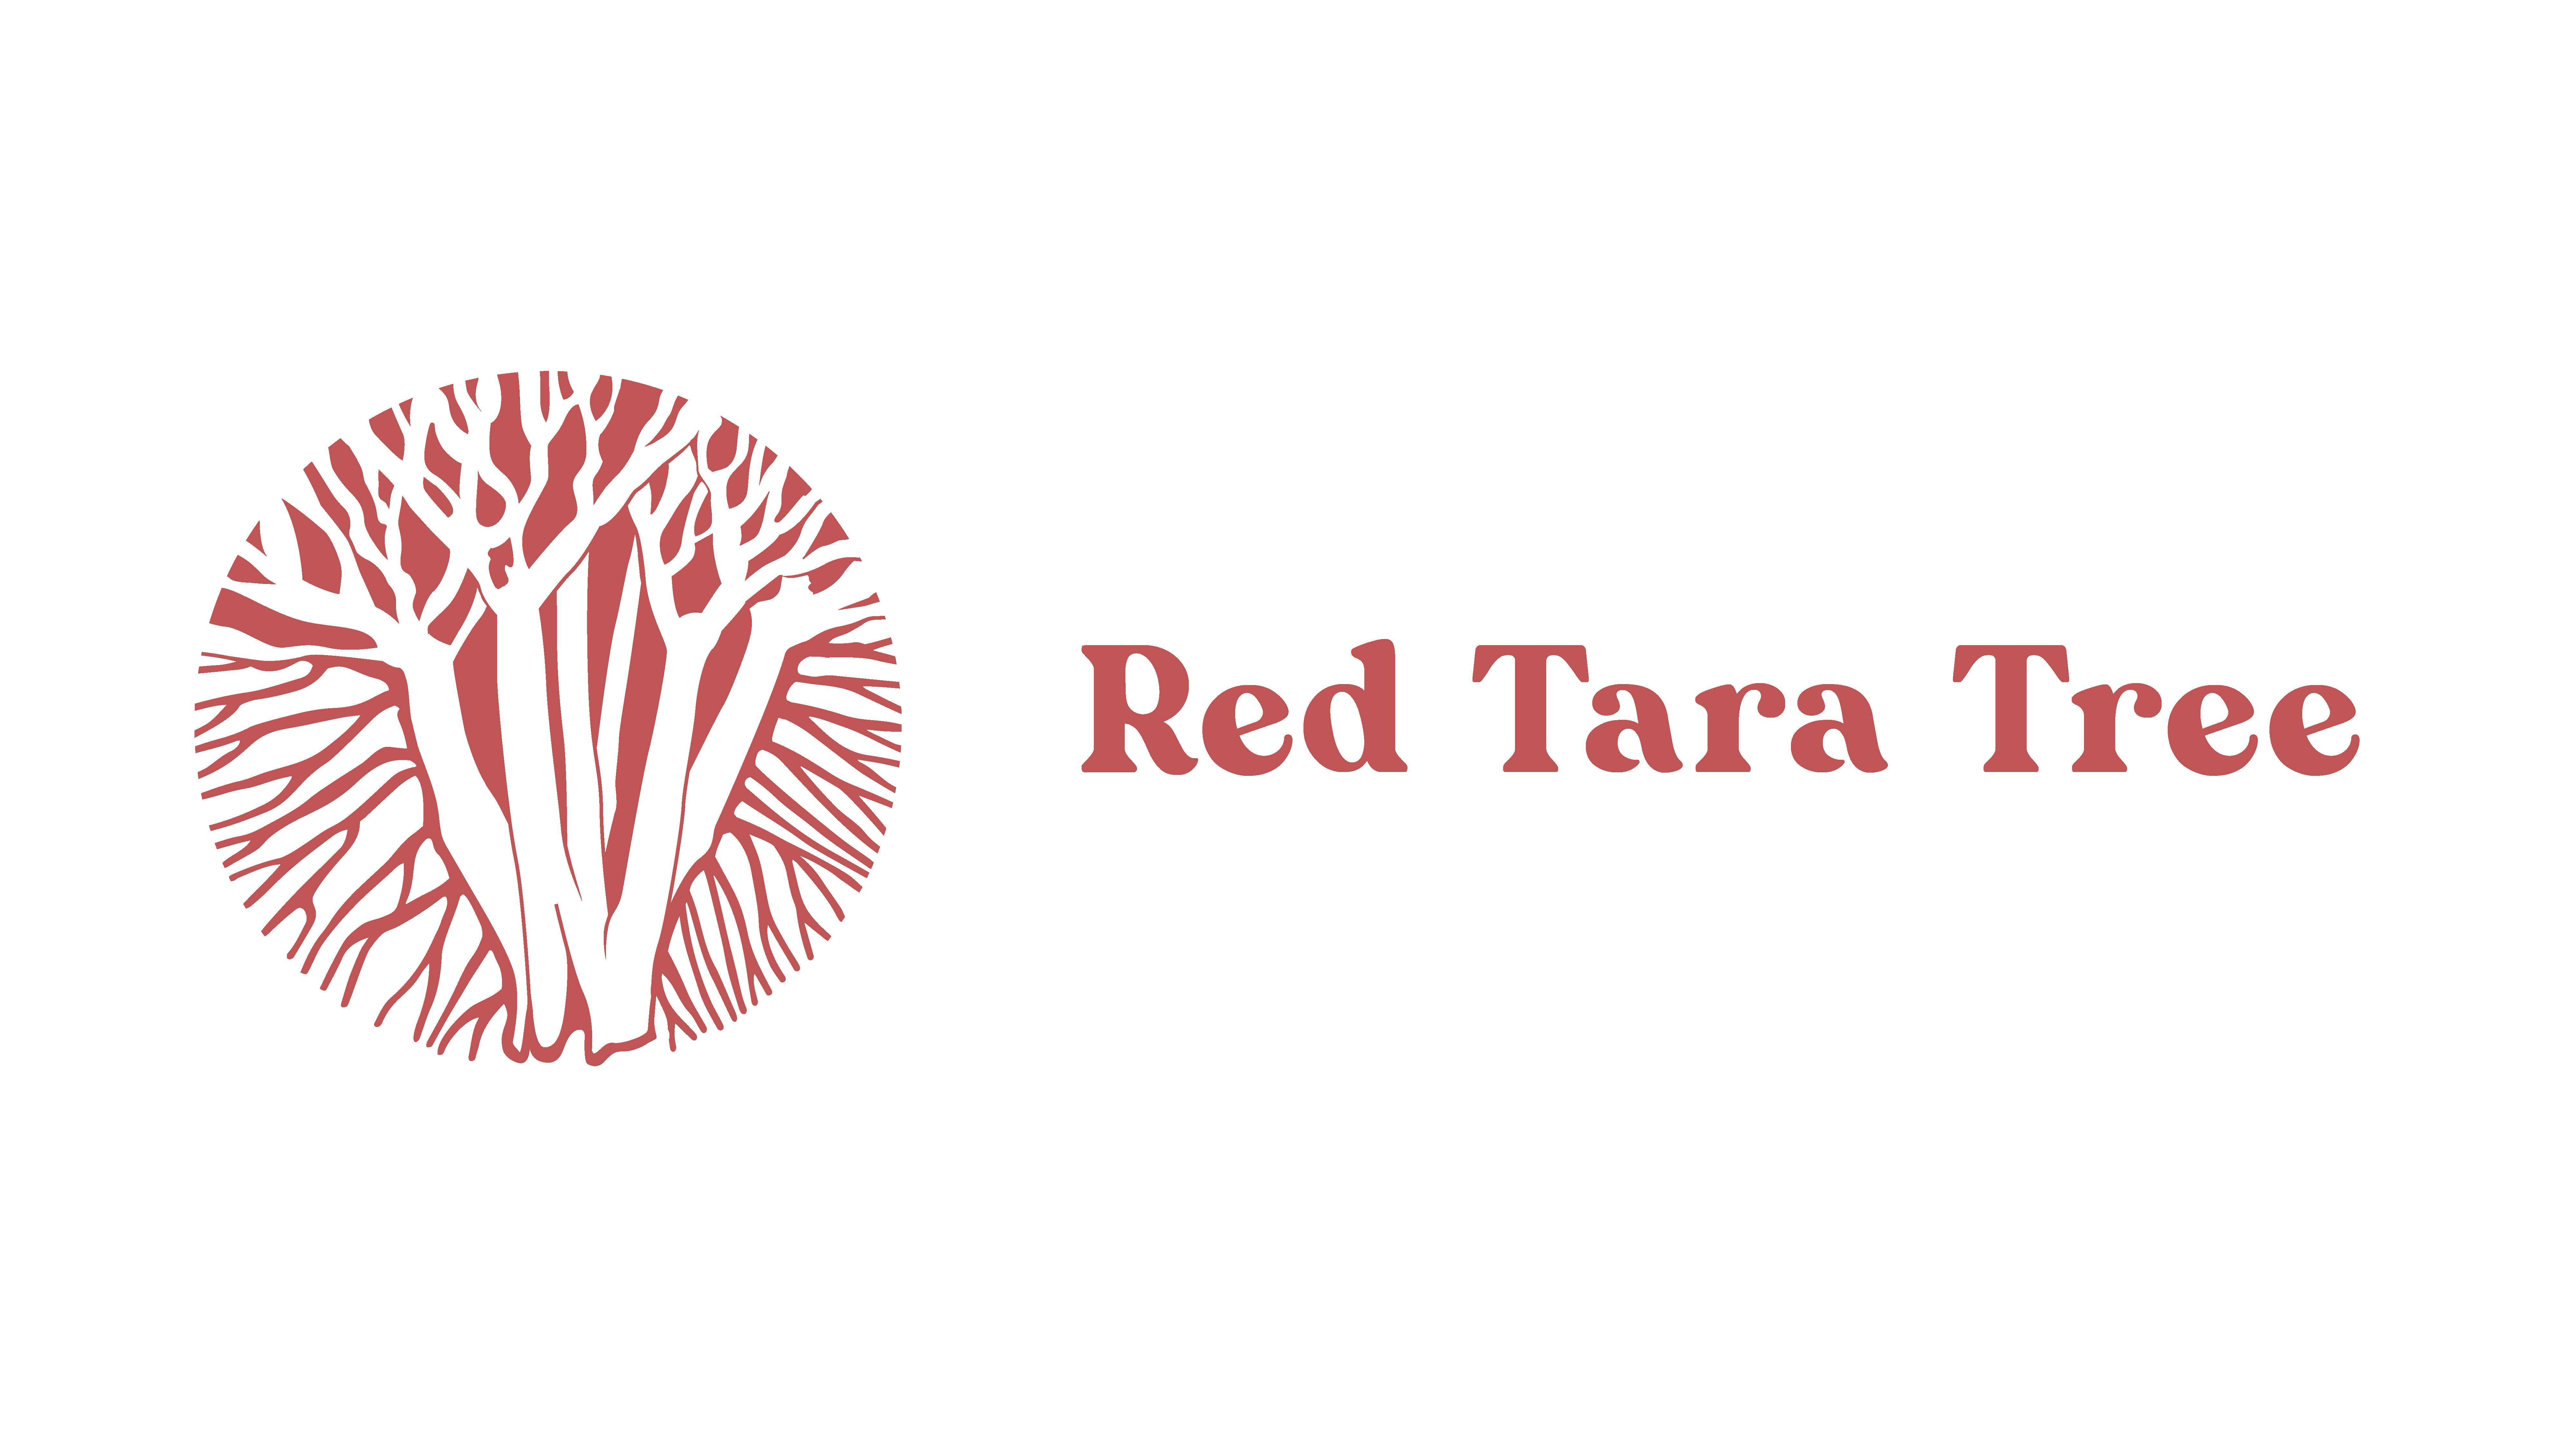 Red Tara Tree